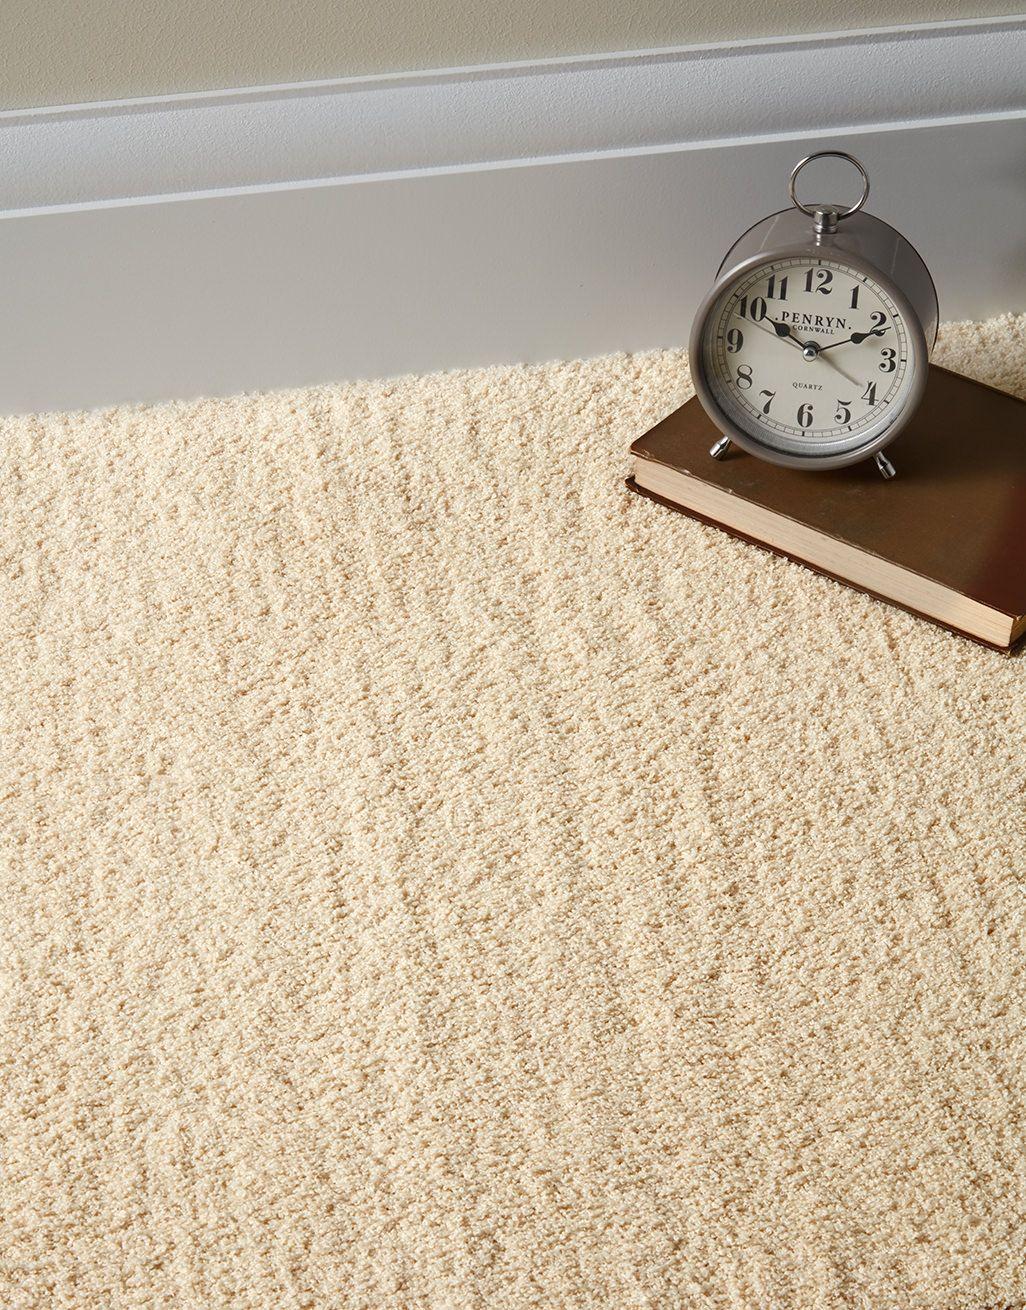 Mauritius Bologna Carpet Underlay Hallway Carpet Runners Flooring Cost